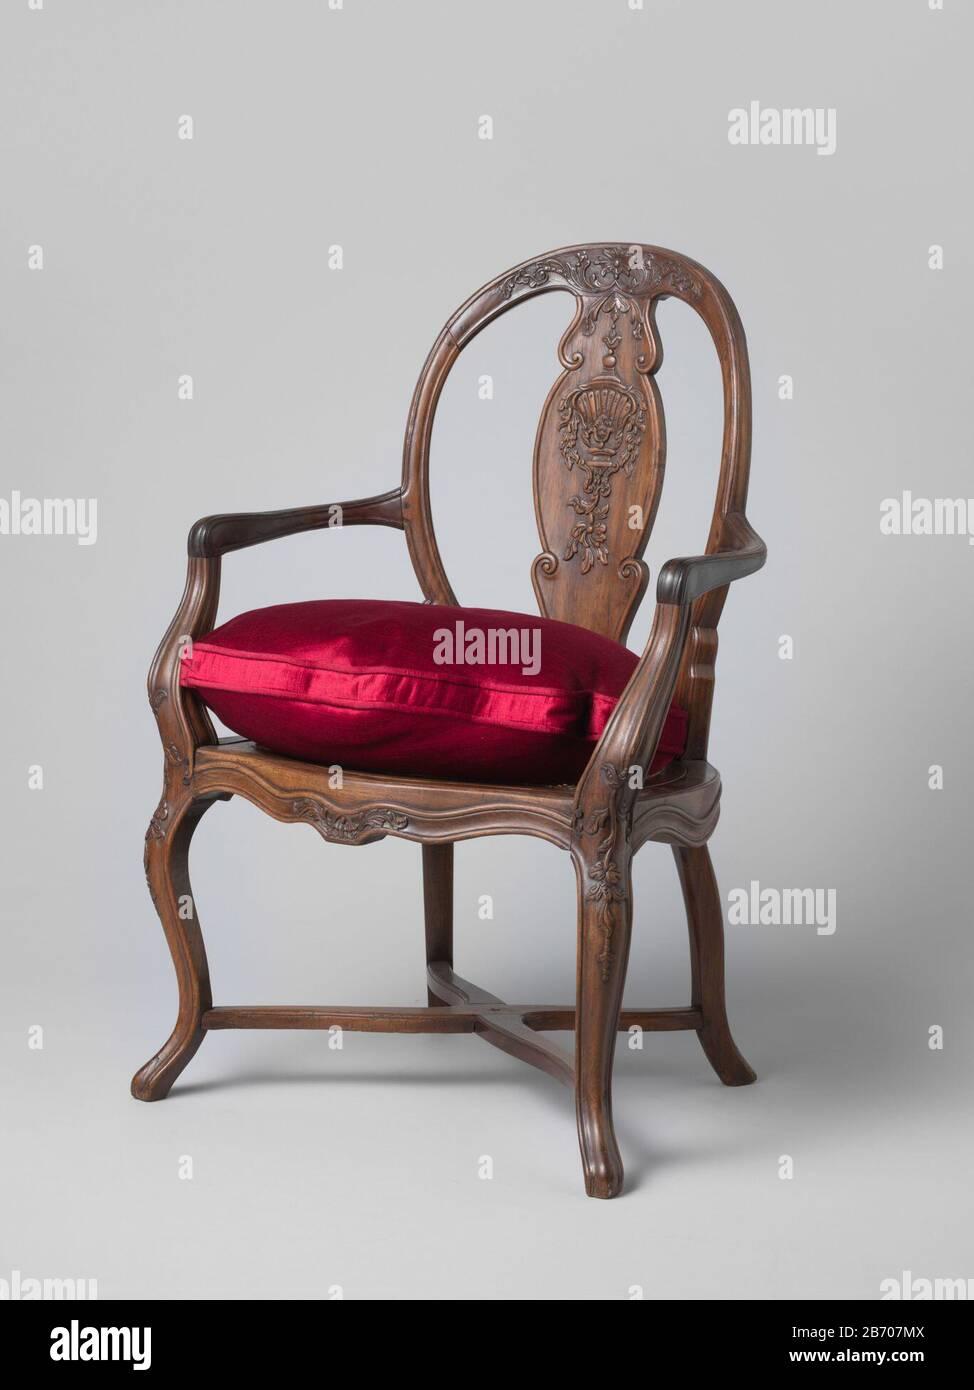 Egg Chair Rotan.Rotan Stock Photos Rotan Stock Images Page 2 Alamy